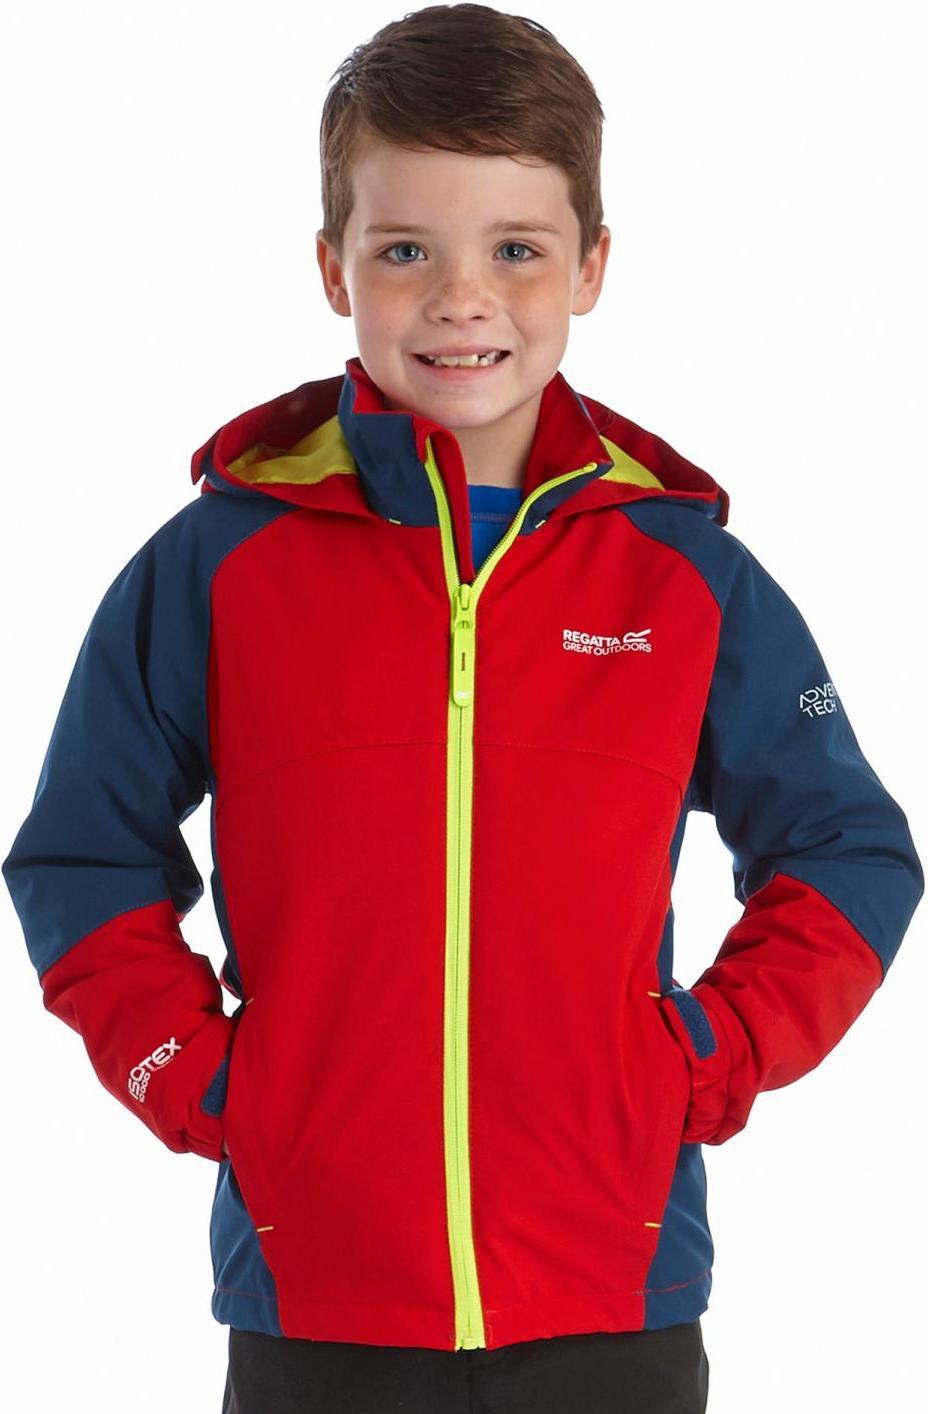 Regatta 兒童款雪衣/化纖外套/防水外套/彈性滑雪外套Paratrooper 童款 RKP134 3MA紅